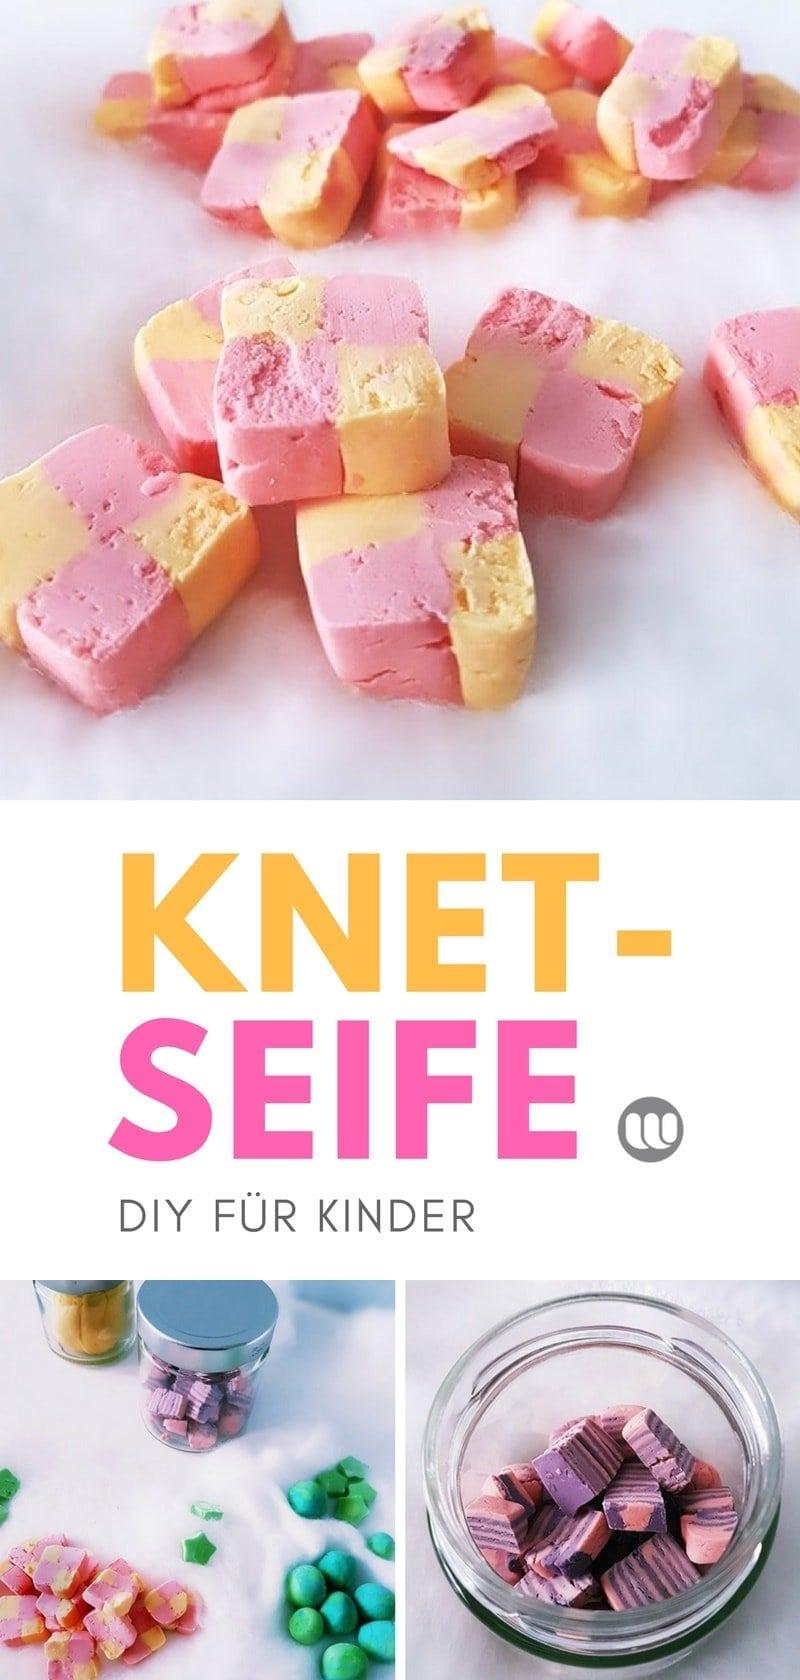 Kinder Knetseife selber machen - Anleitung: Knetbare Seife DIY Kosmetik